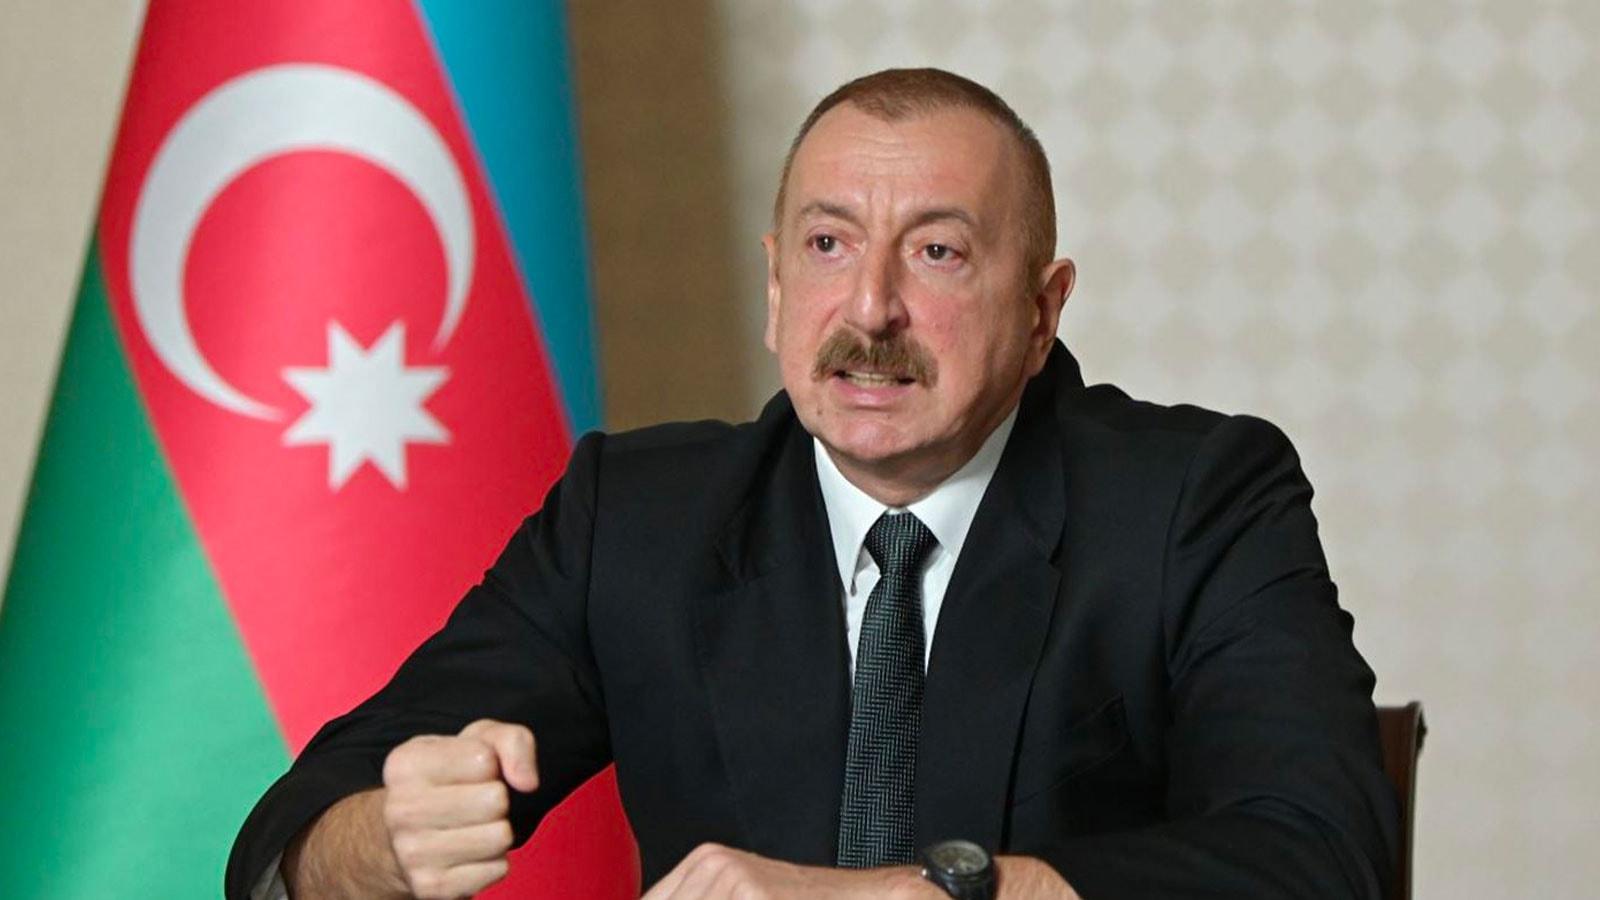 Aliyev duyurdu! Hudaferin Köprüsü'ne Azerbaycan bayrağı dikildi